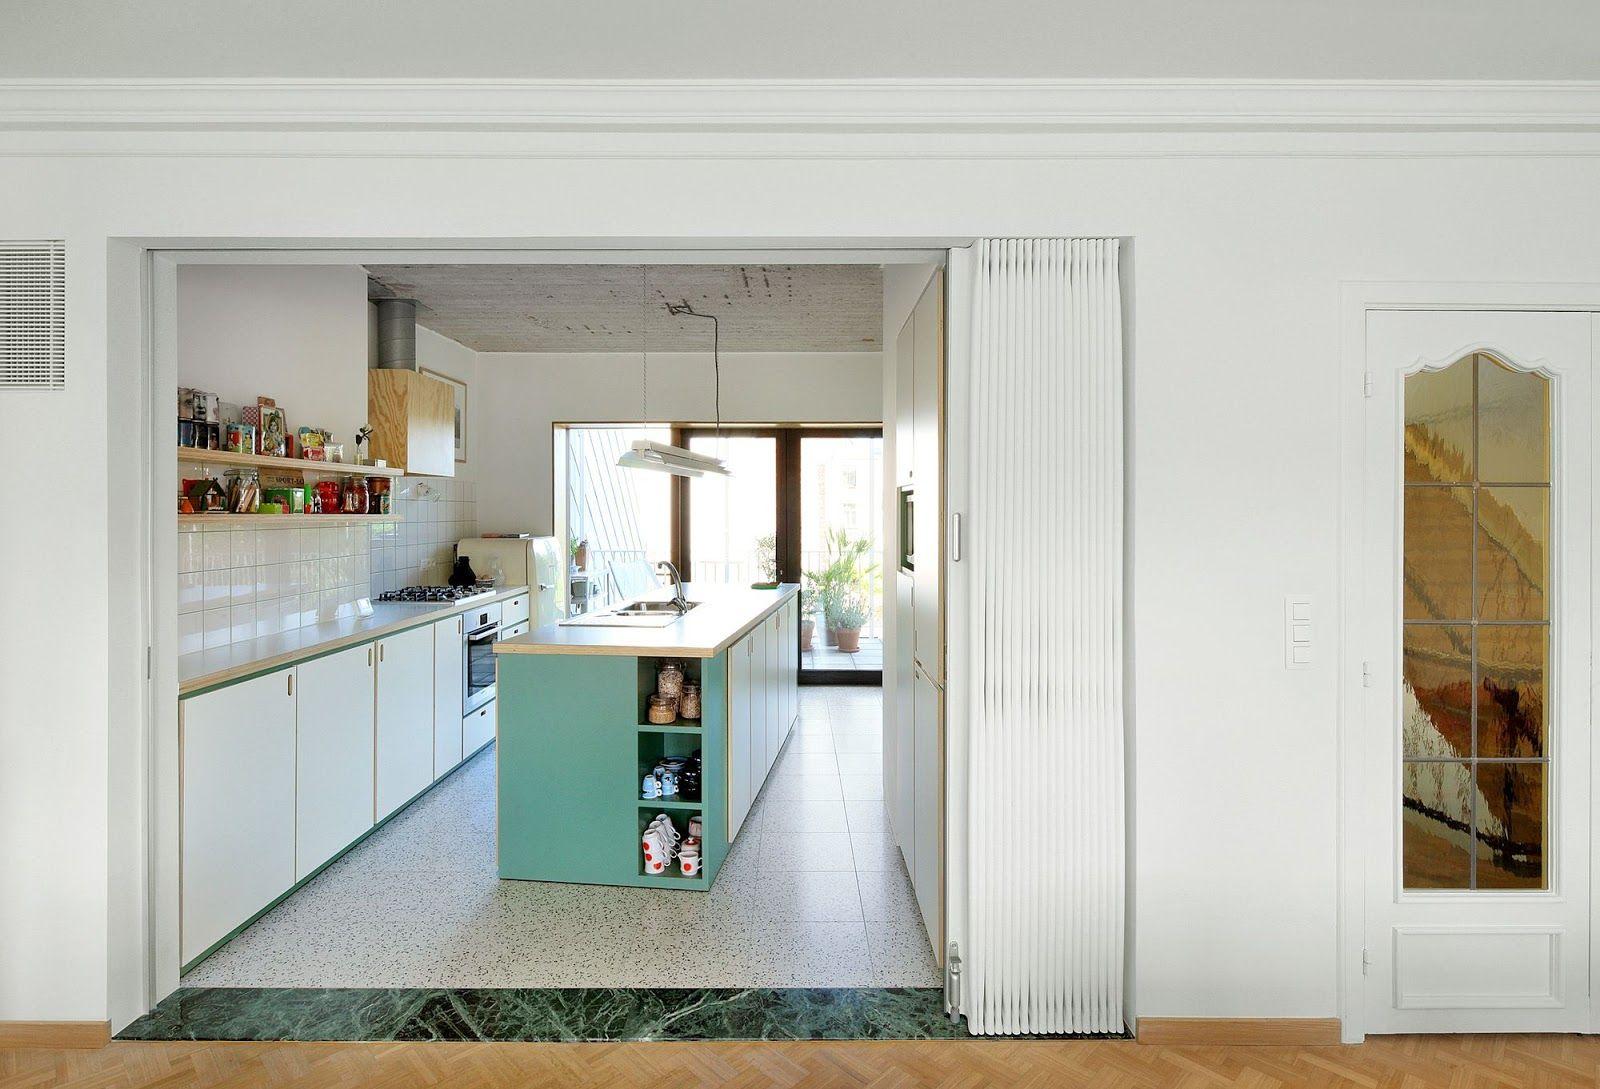 Dierendonckblancke Architects Renovation Of A Terraced House  # Muebles Kowalczuk